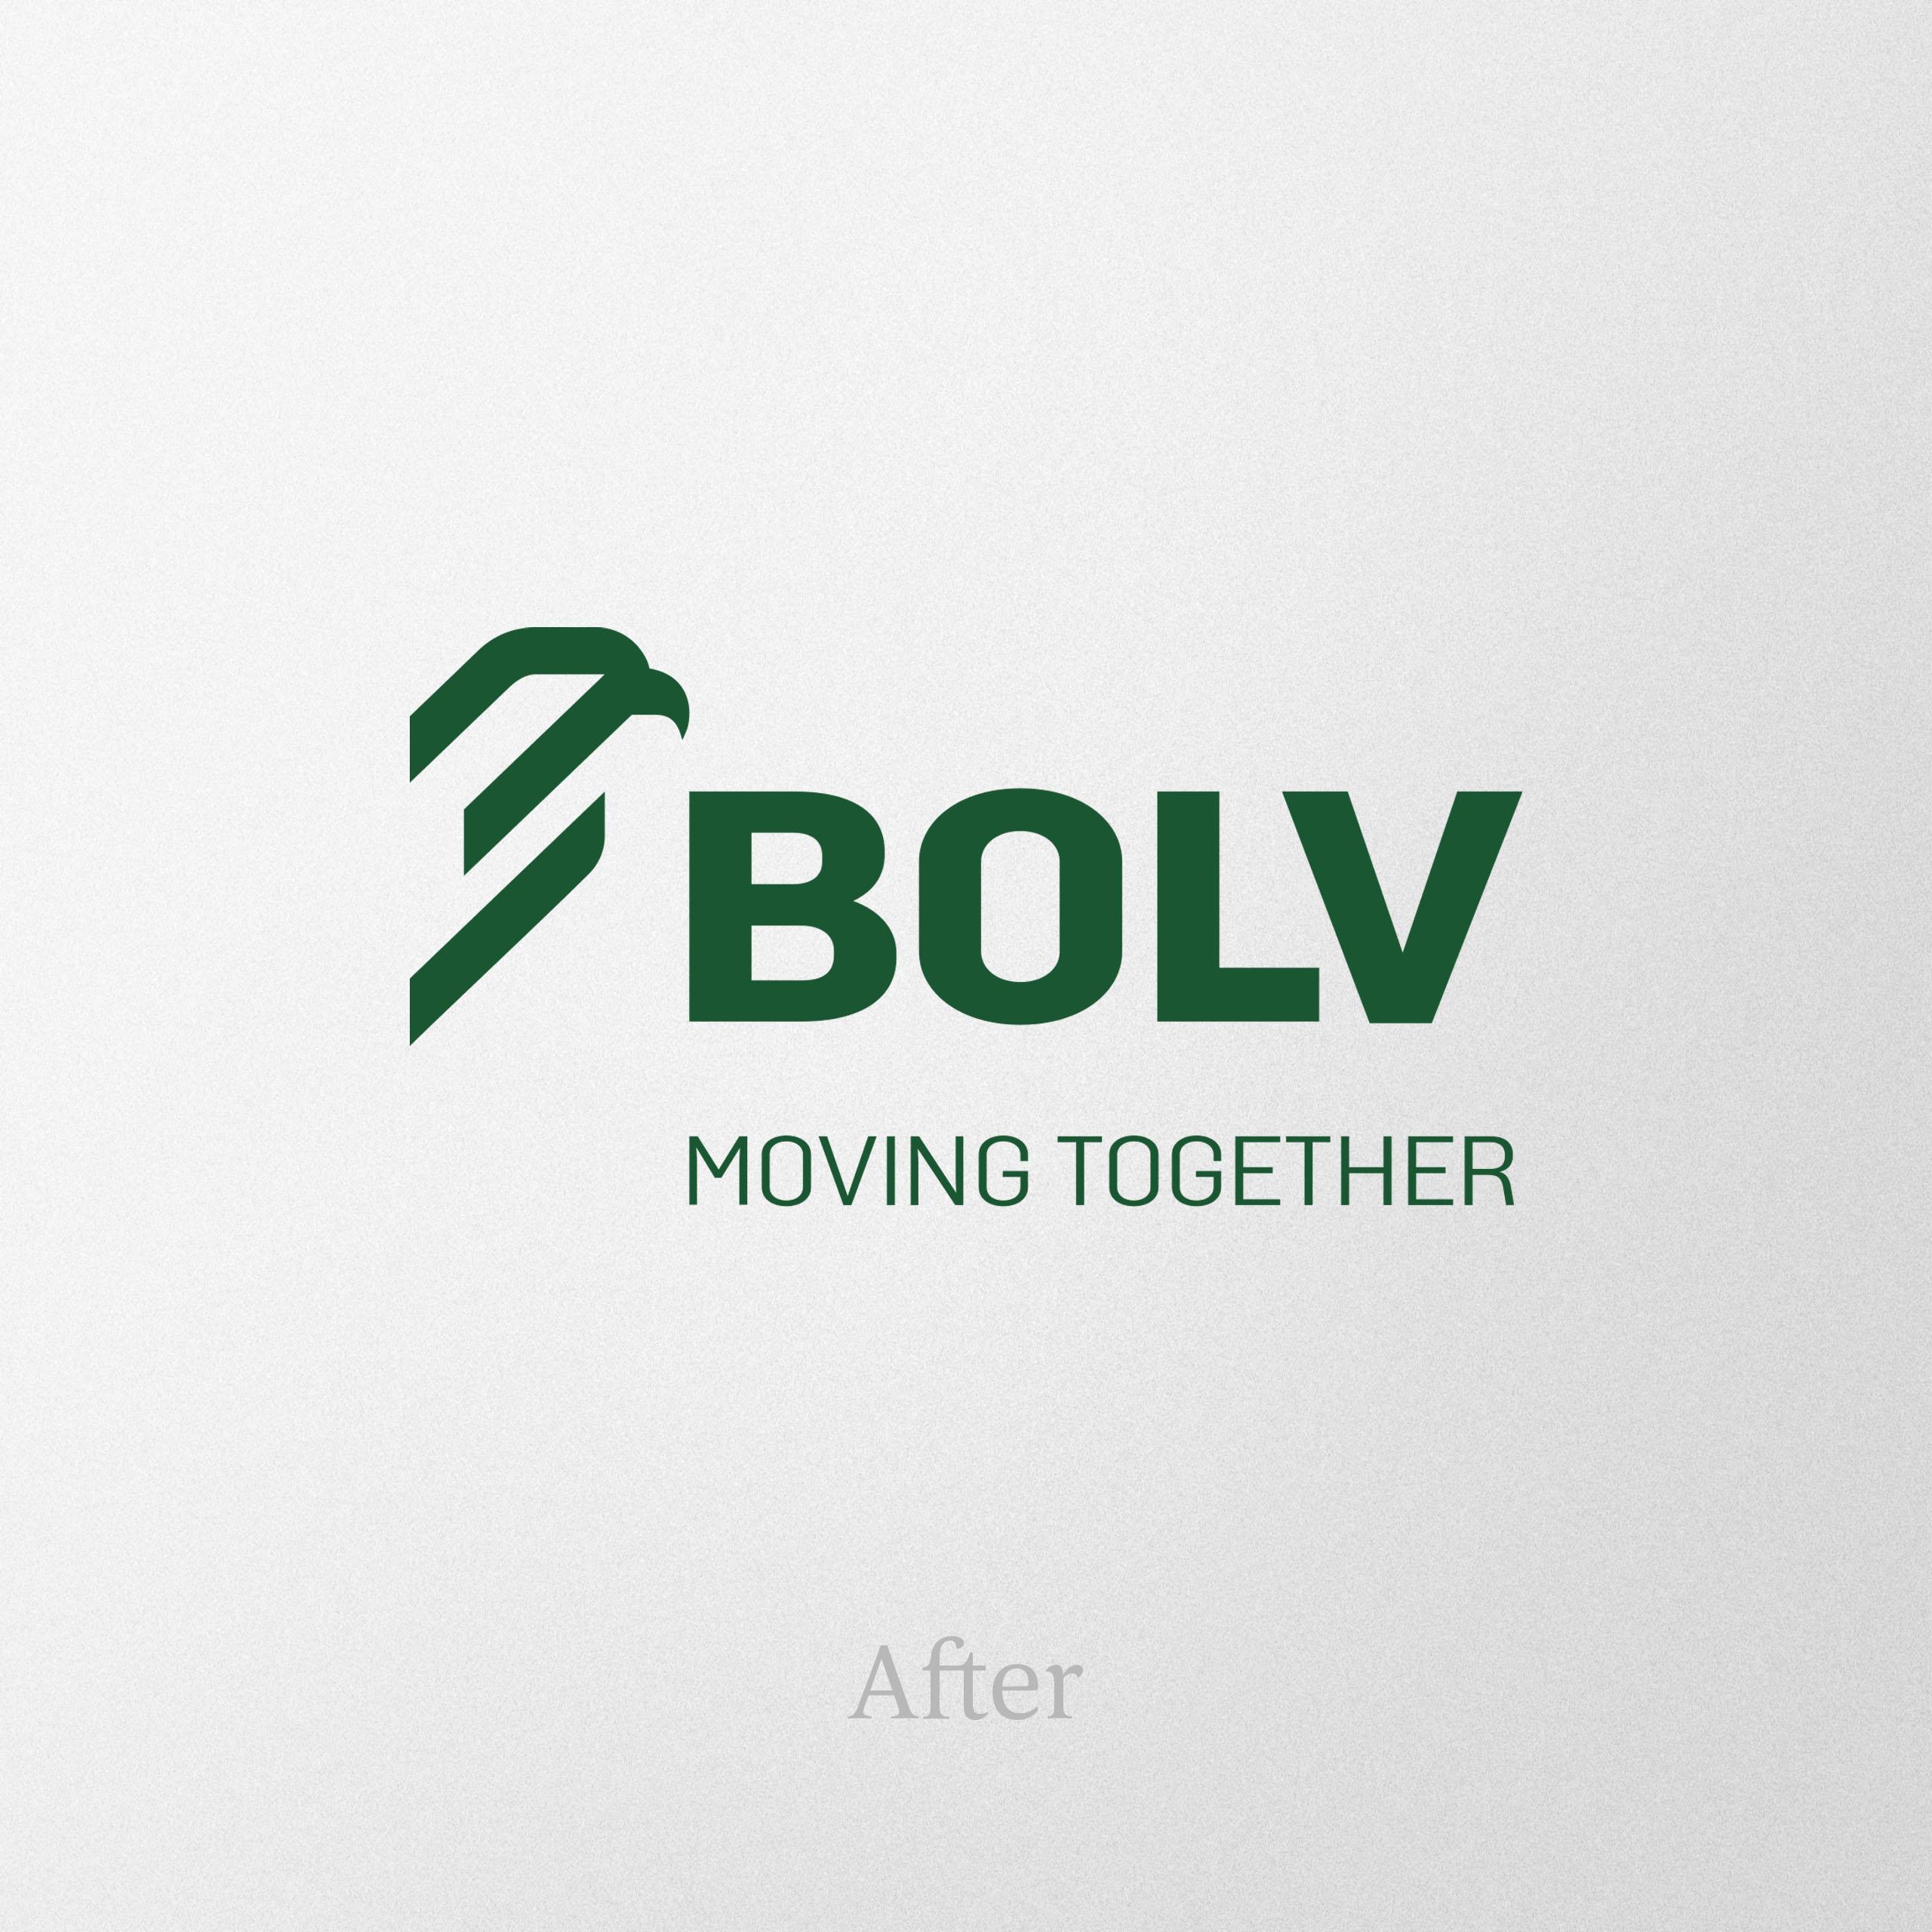 Bolv Project Img 6 - Vatra Agency / Founder & CEO Gerton Bejo